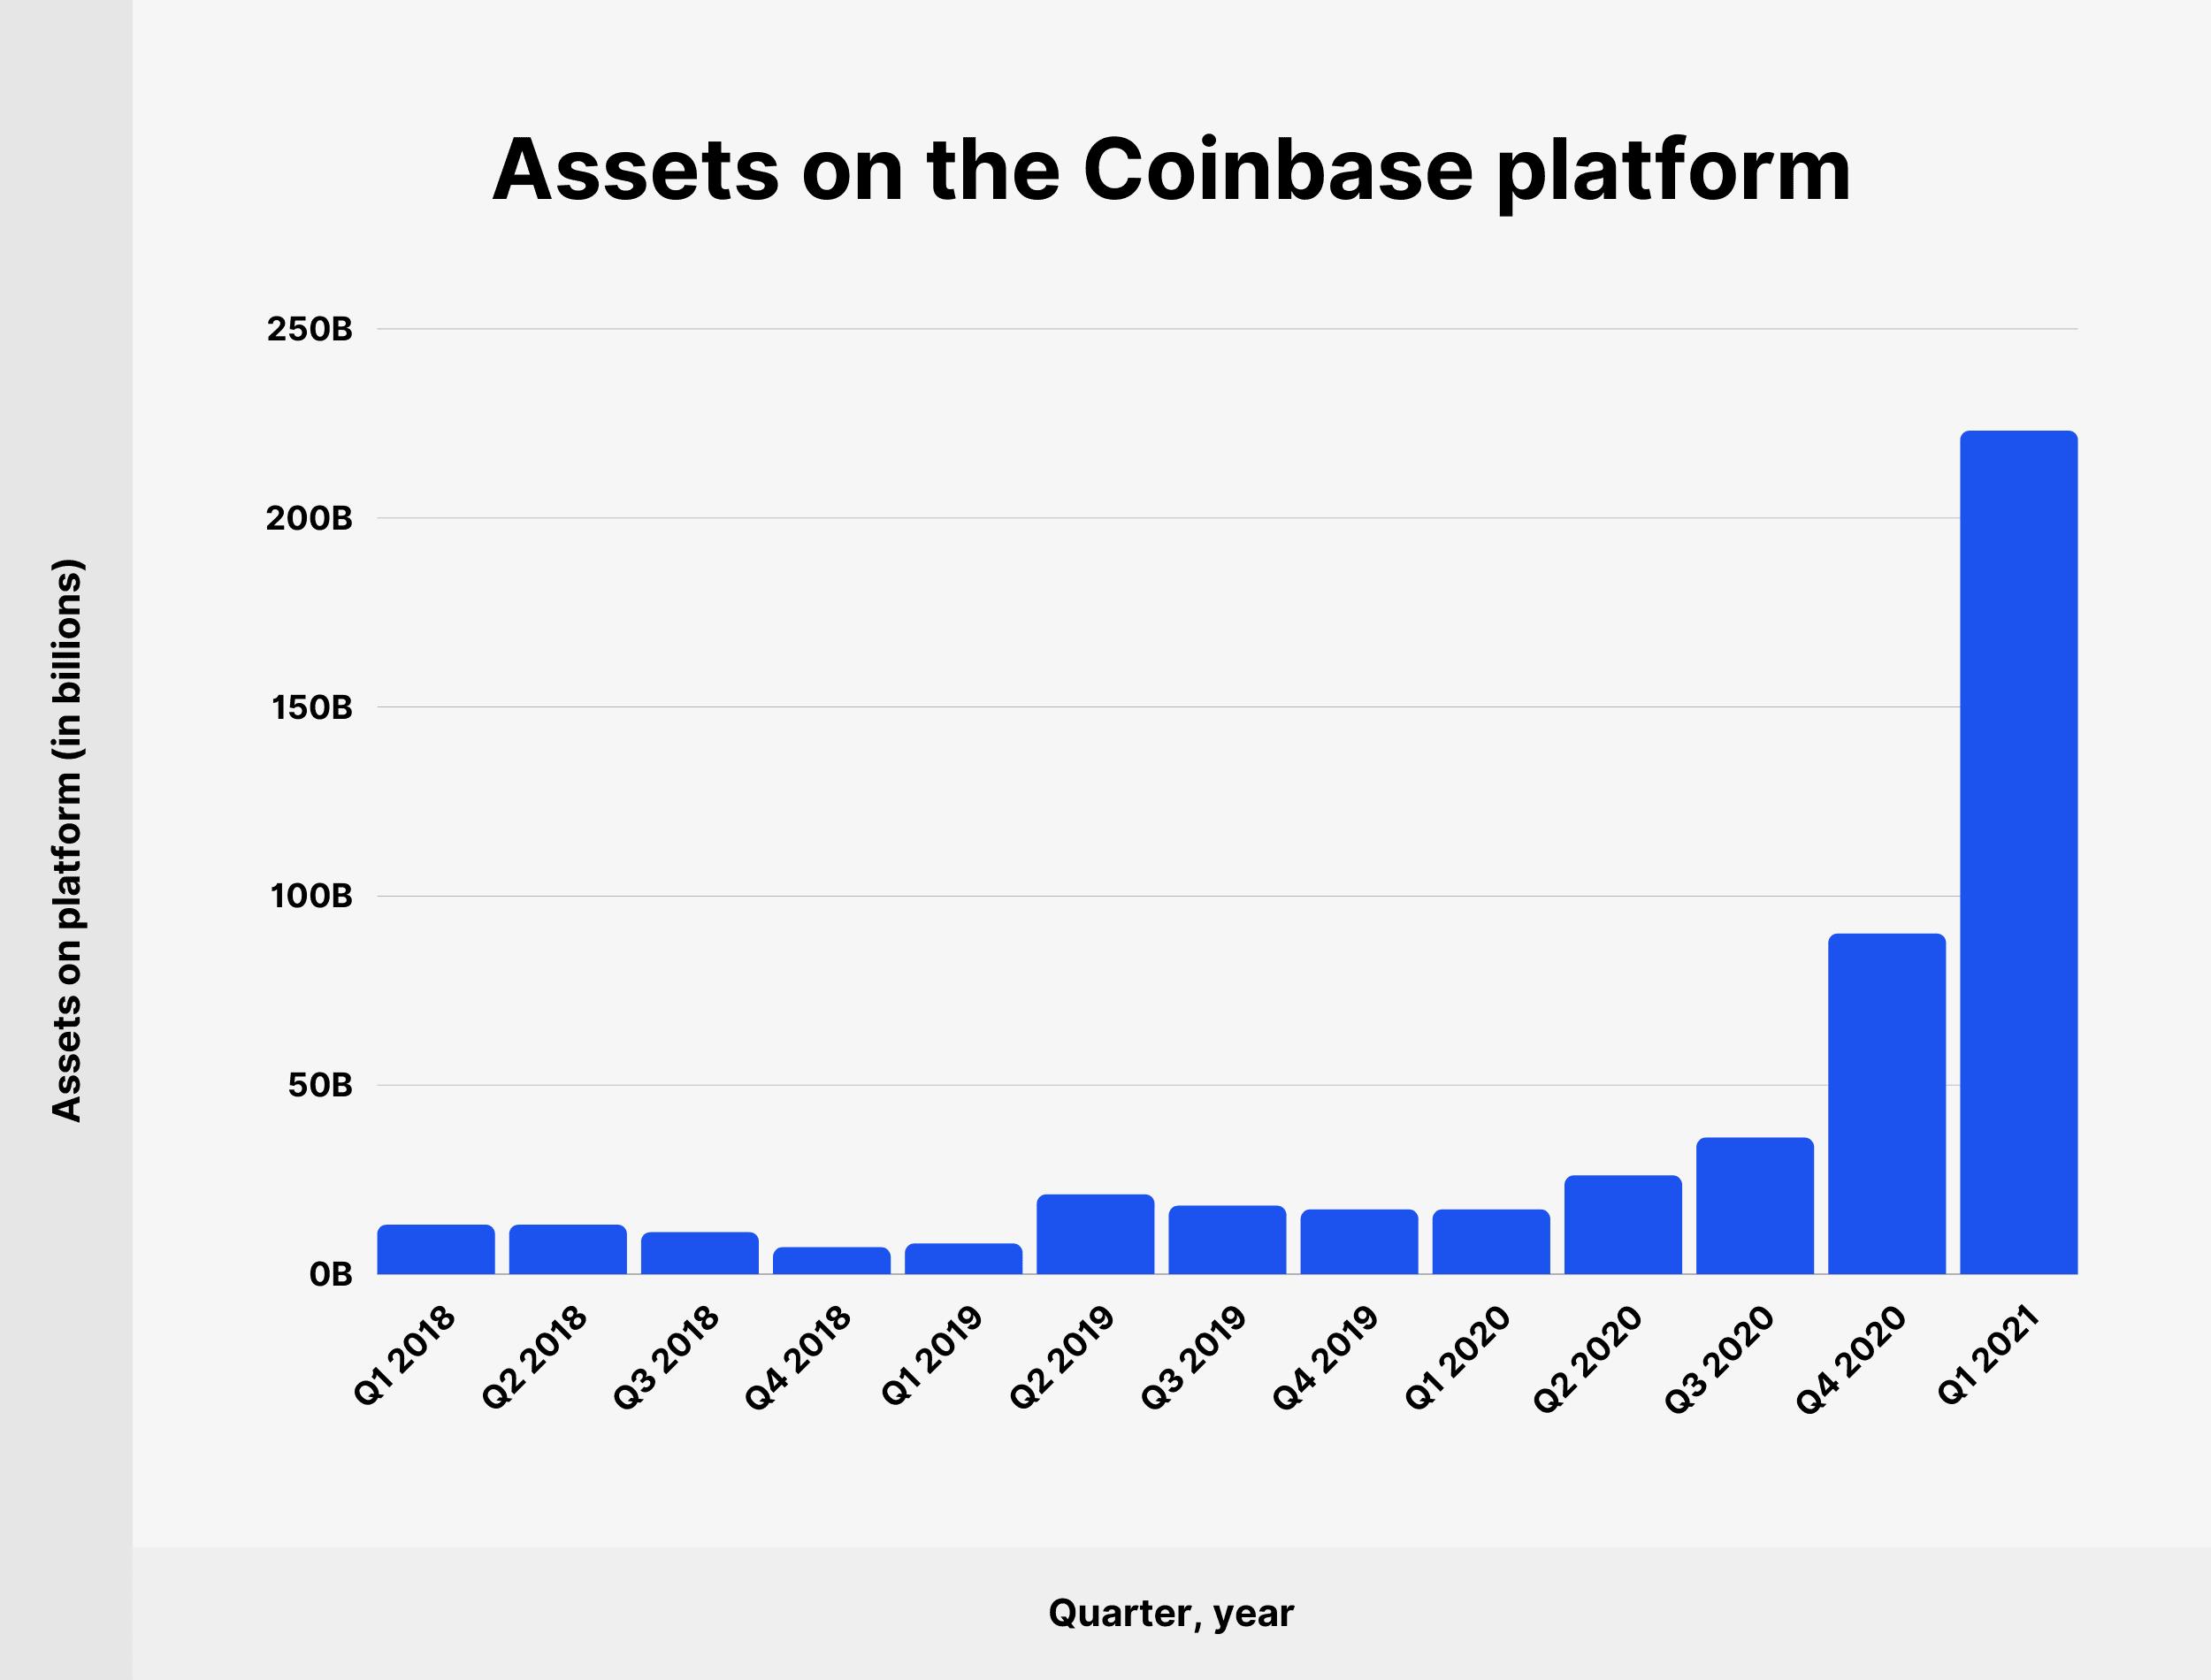 Assets on the Coinbase platform